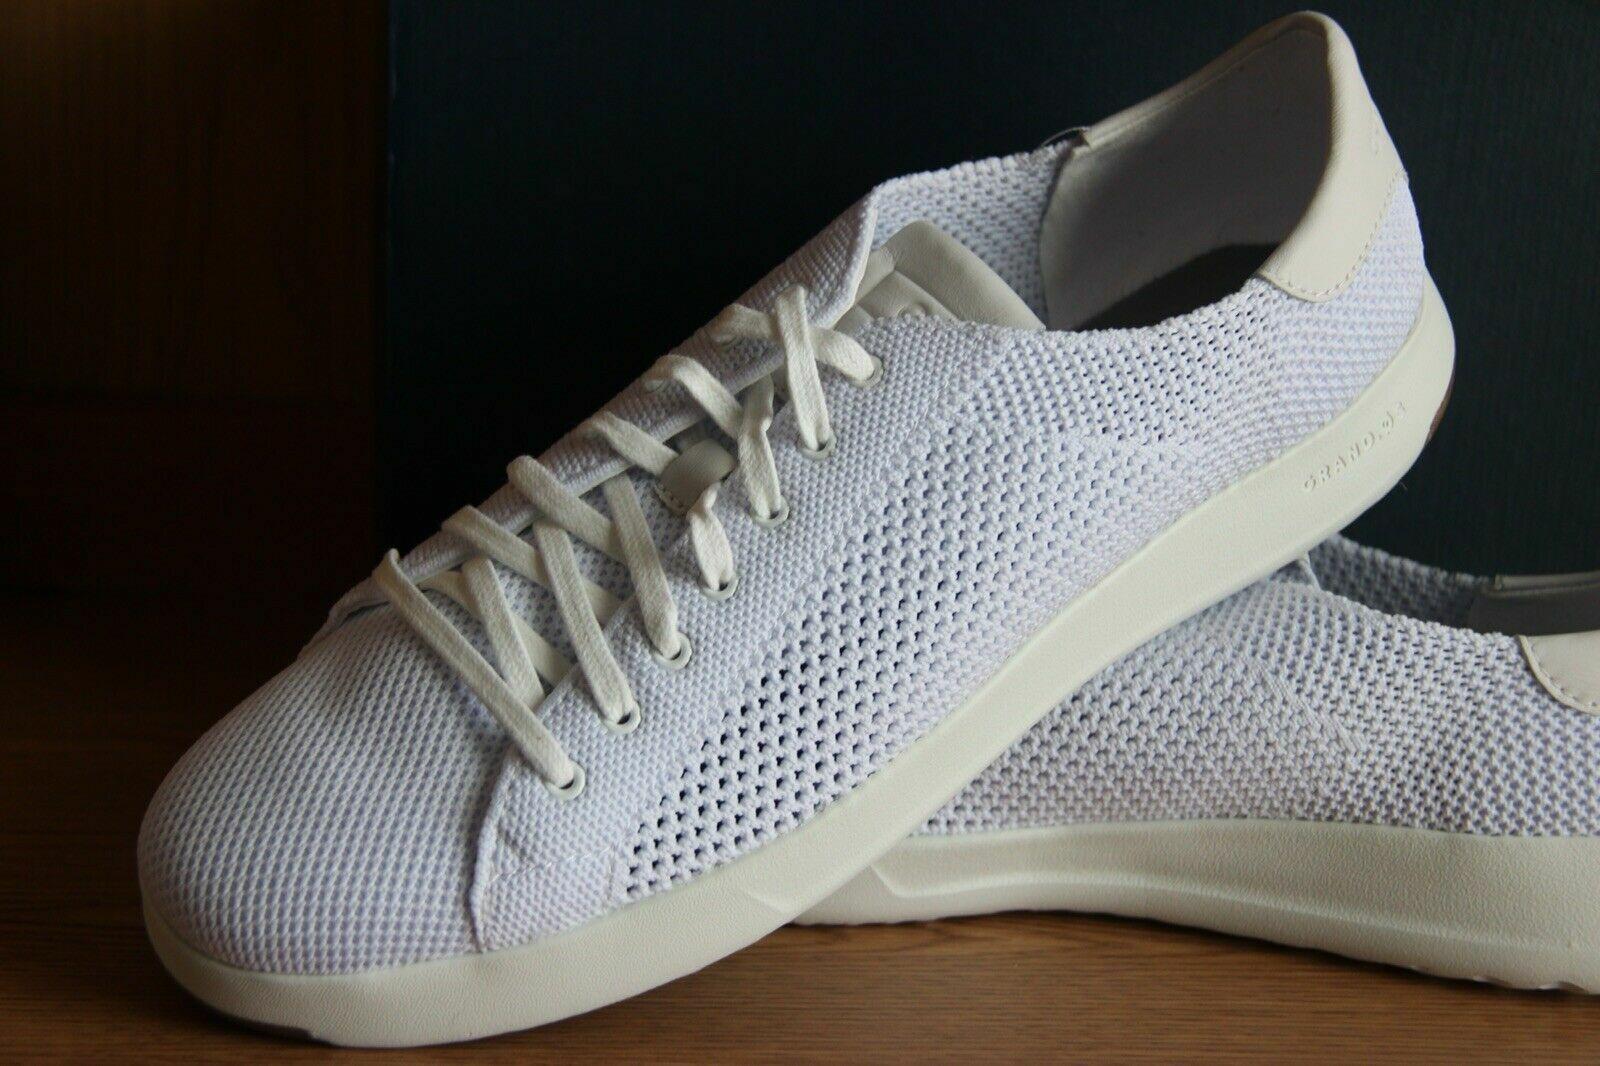 Cole Haan grandpro tenis stitchlite Tenis Hombres en blancoo Talla 12 C26626